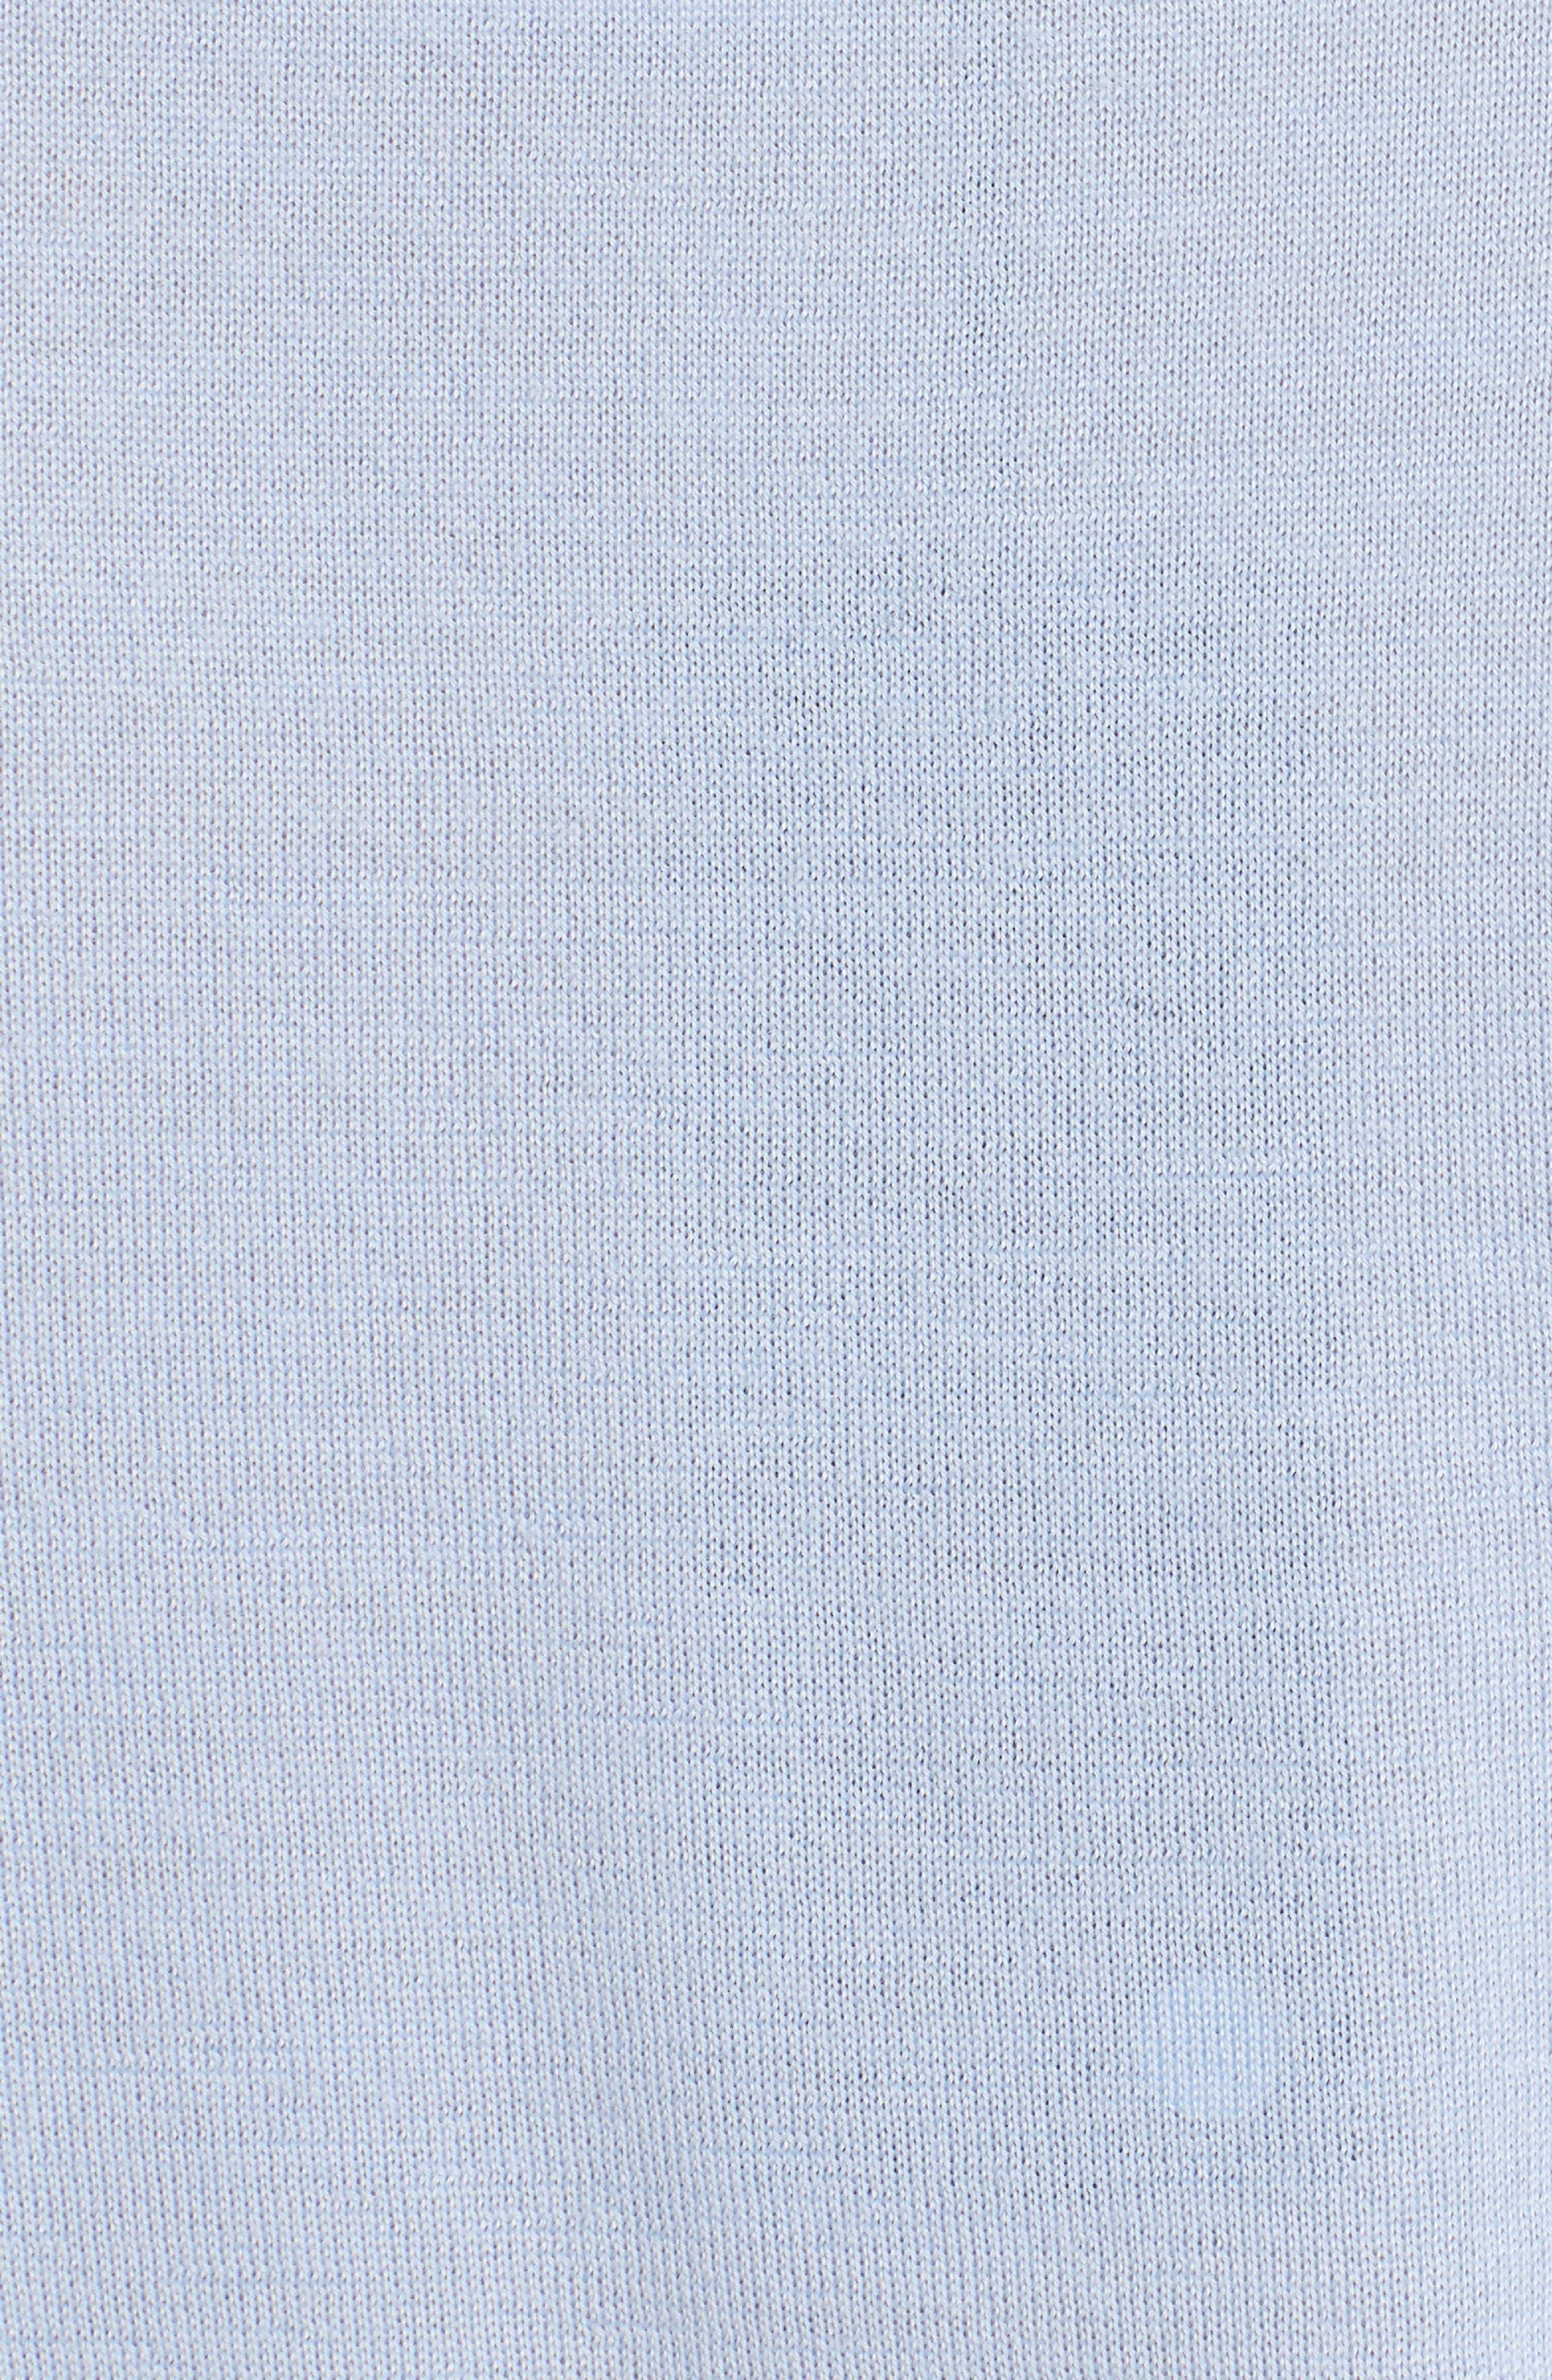 Cashmere & Silk Shell,                             Alternate thumbnail 3, color,                             Light Blue